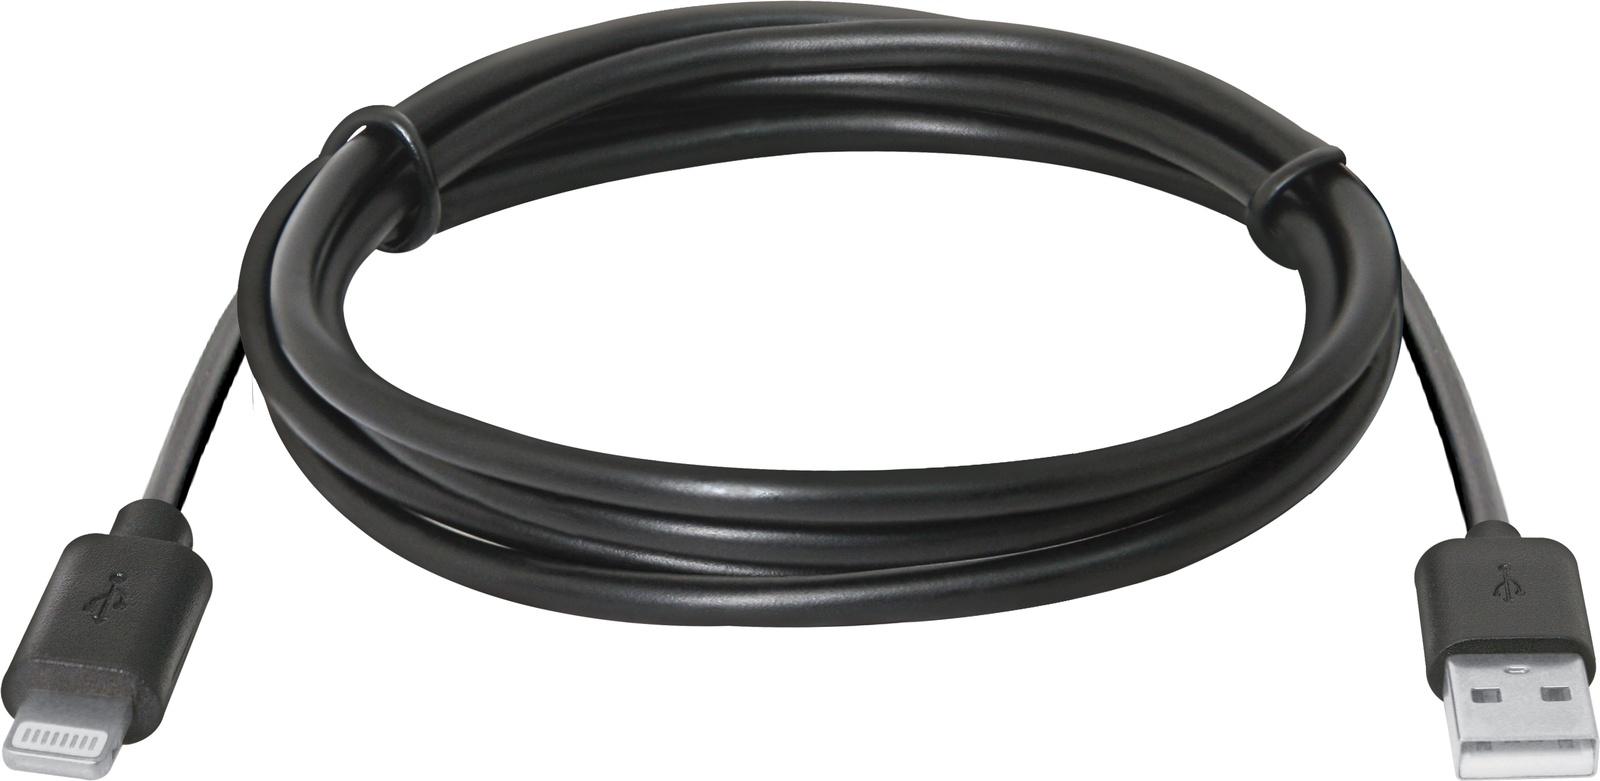 USB кабель Defender ACH01-03BH для Apple, USB(AM)-Lightning, 1 м, 87478, черный все цены